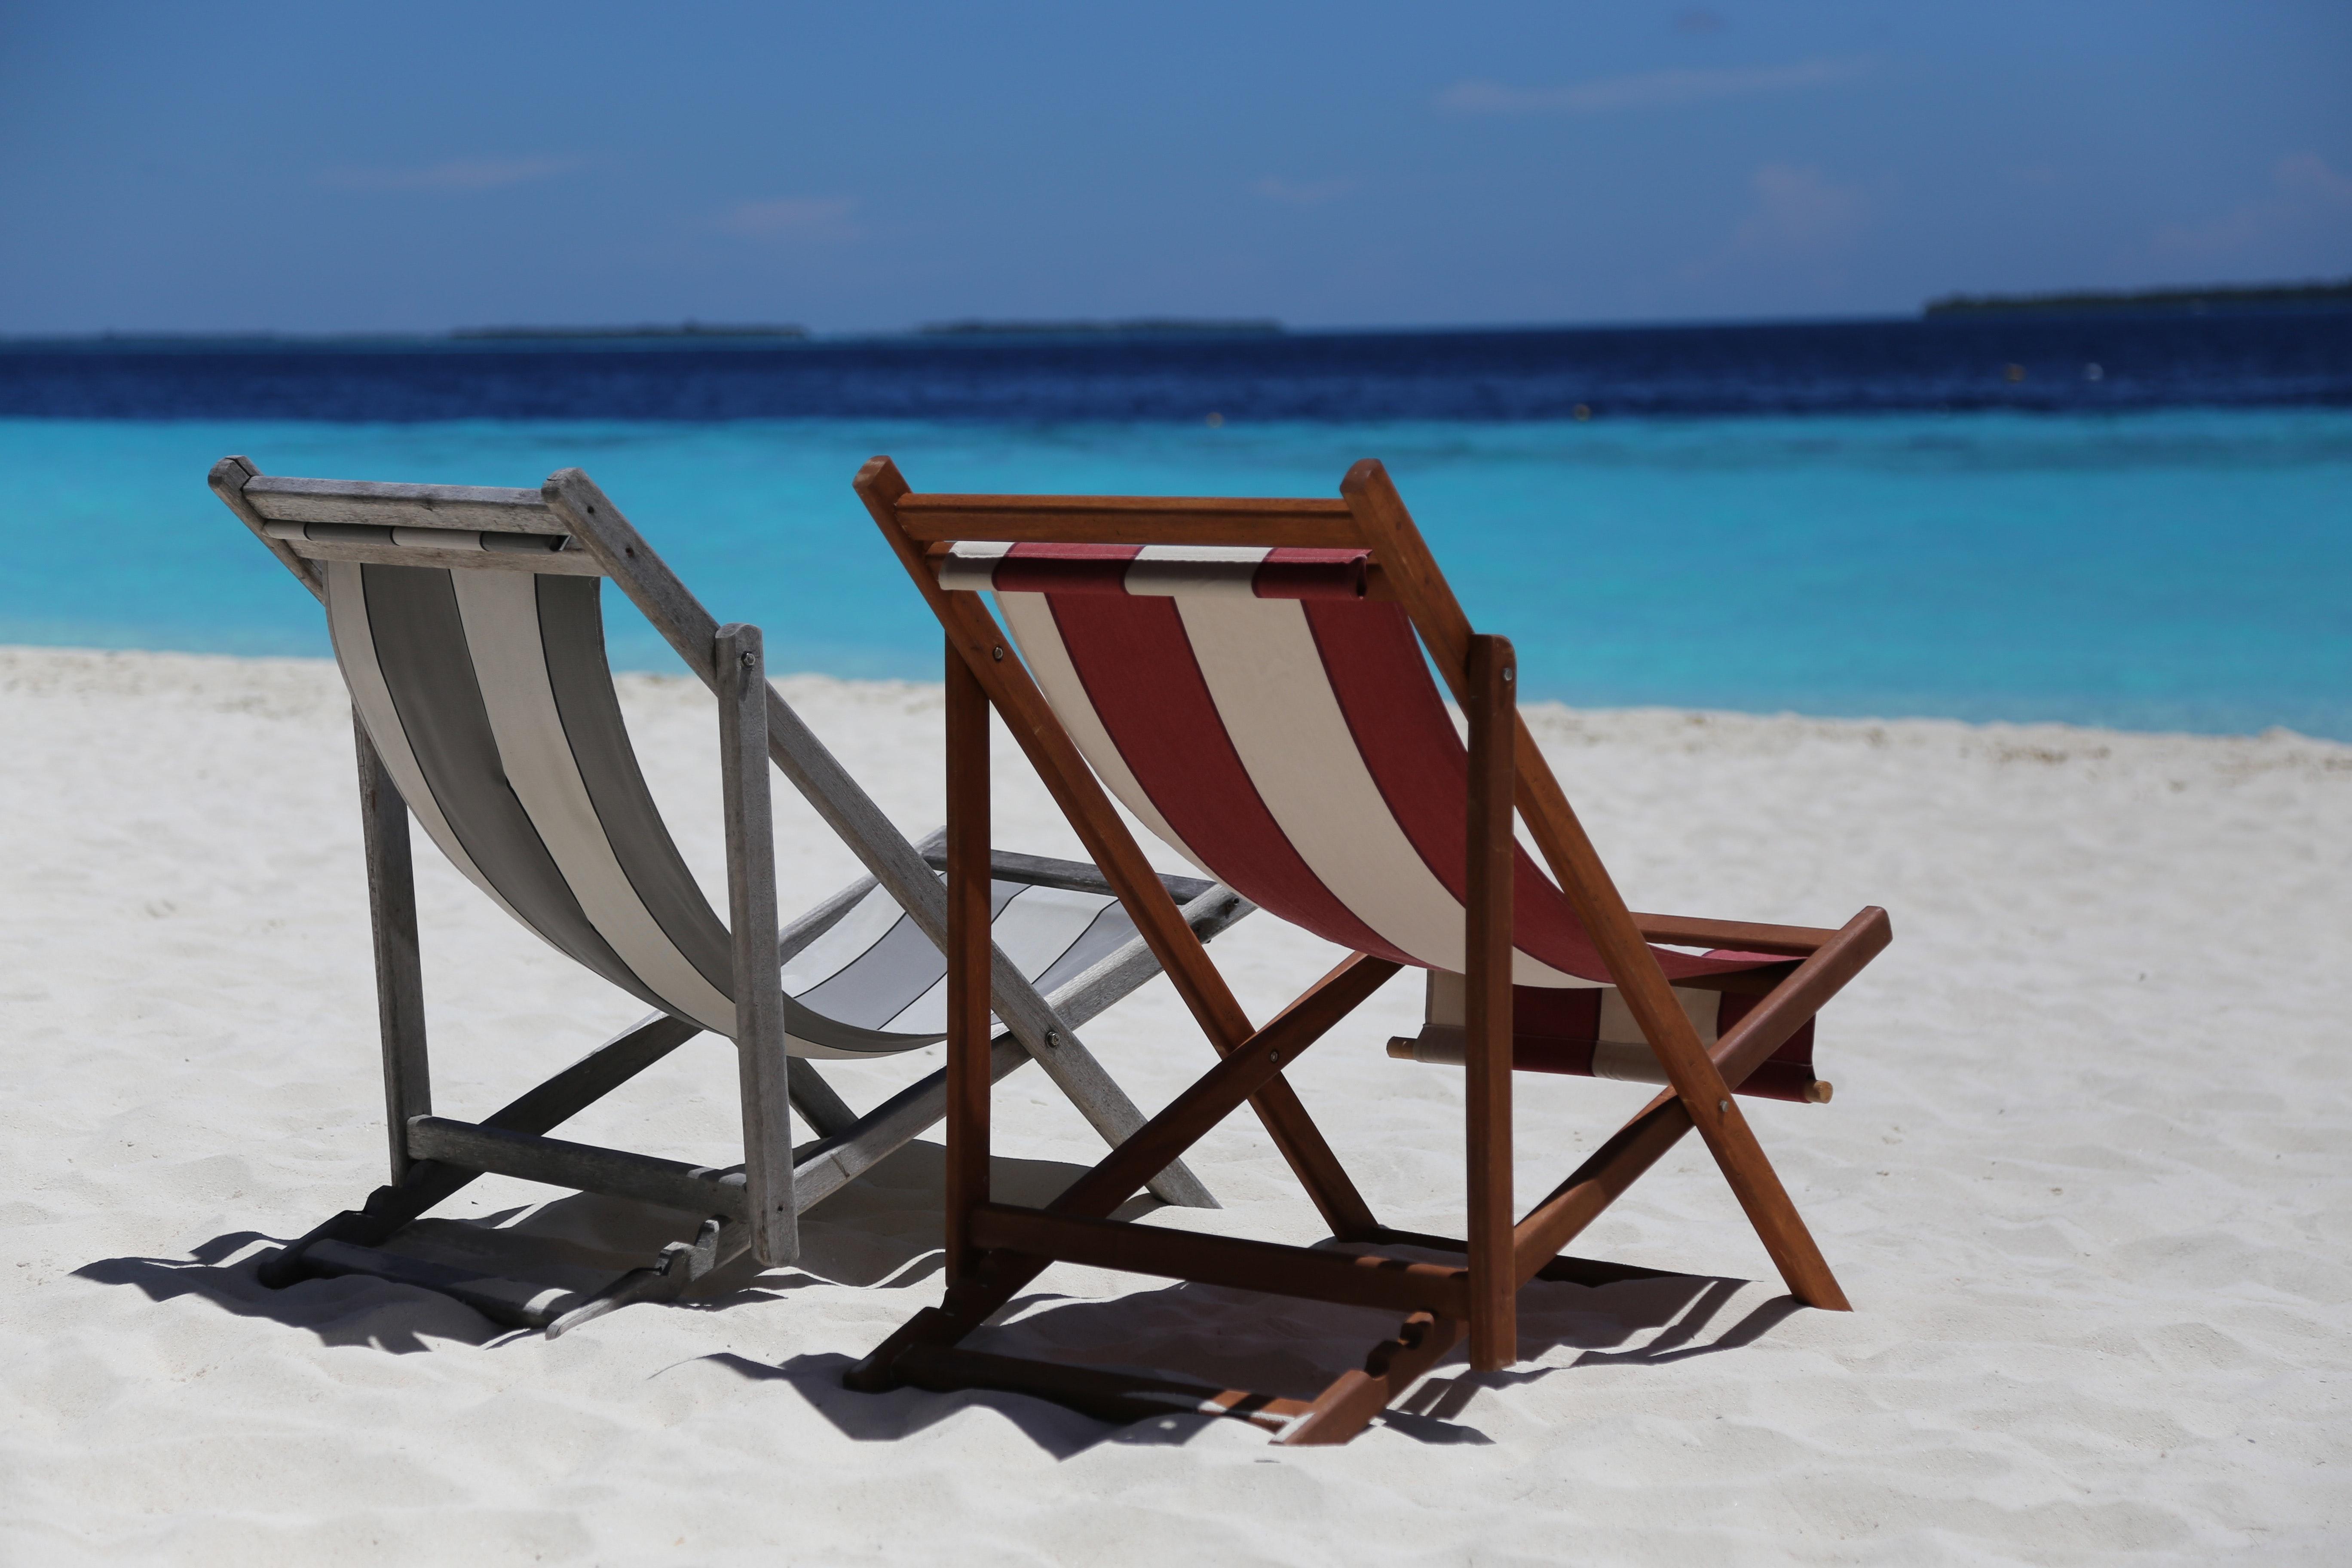 quest sporting goods stripe blue atoll s beach dick is chair p noimagefound